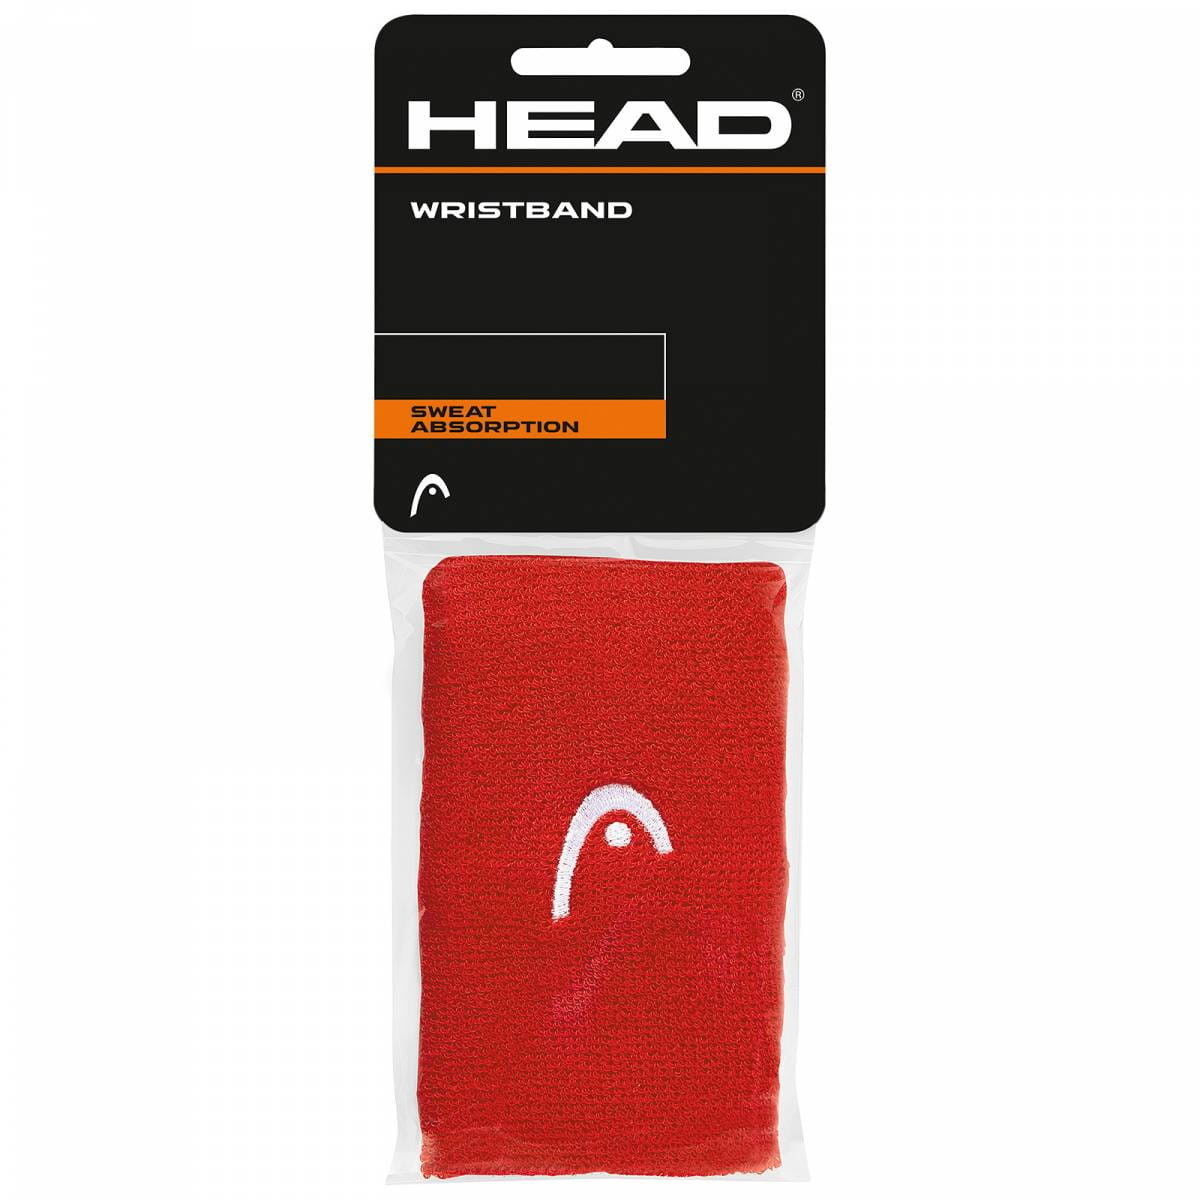 Head Frotki na nadgarstki 5'' - red